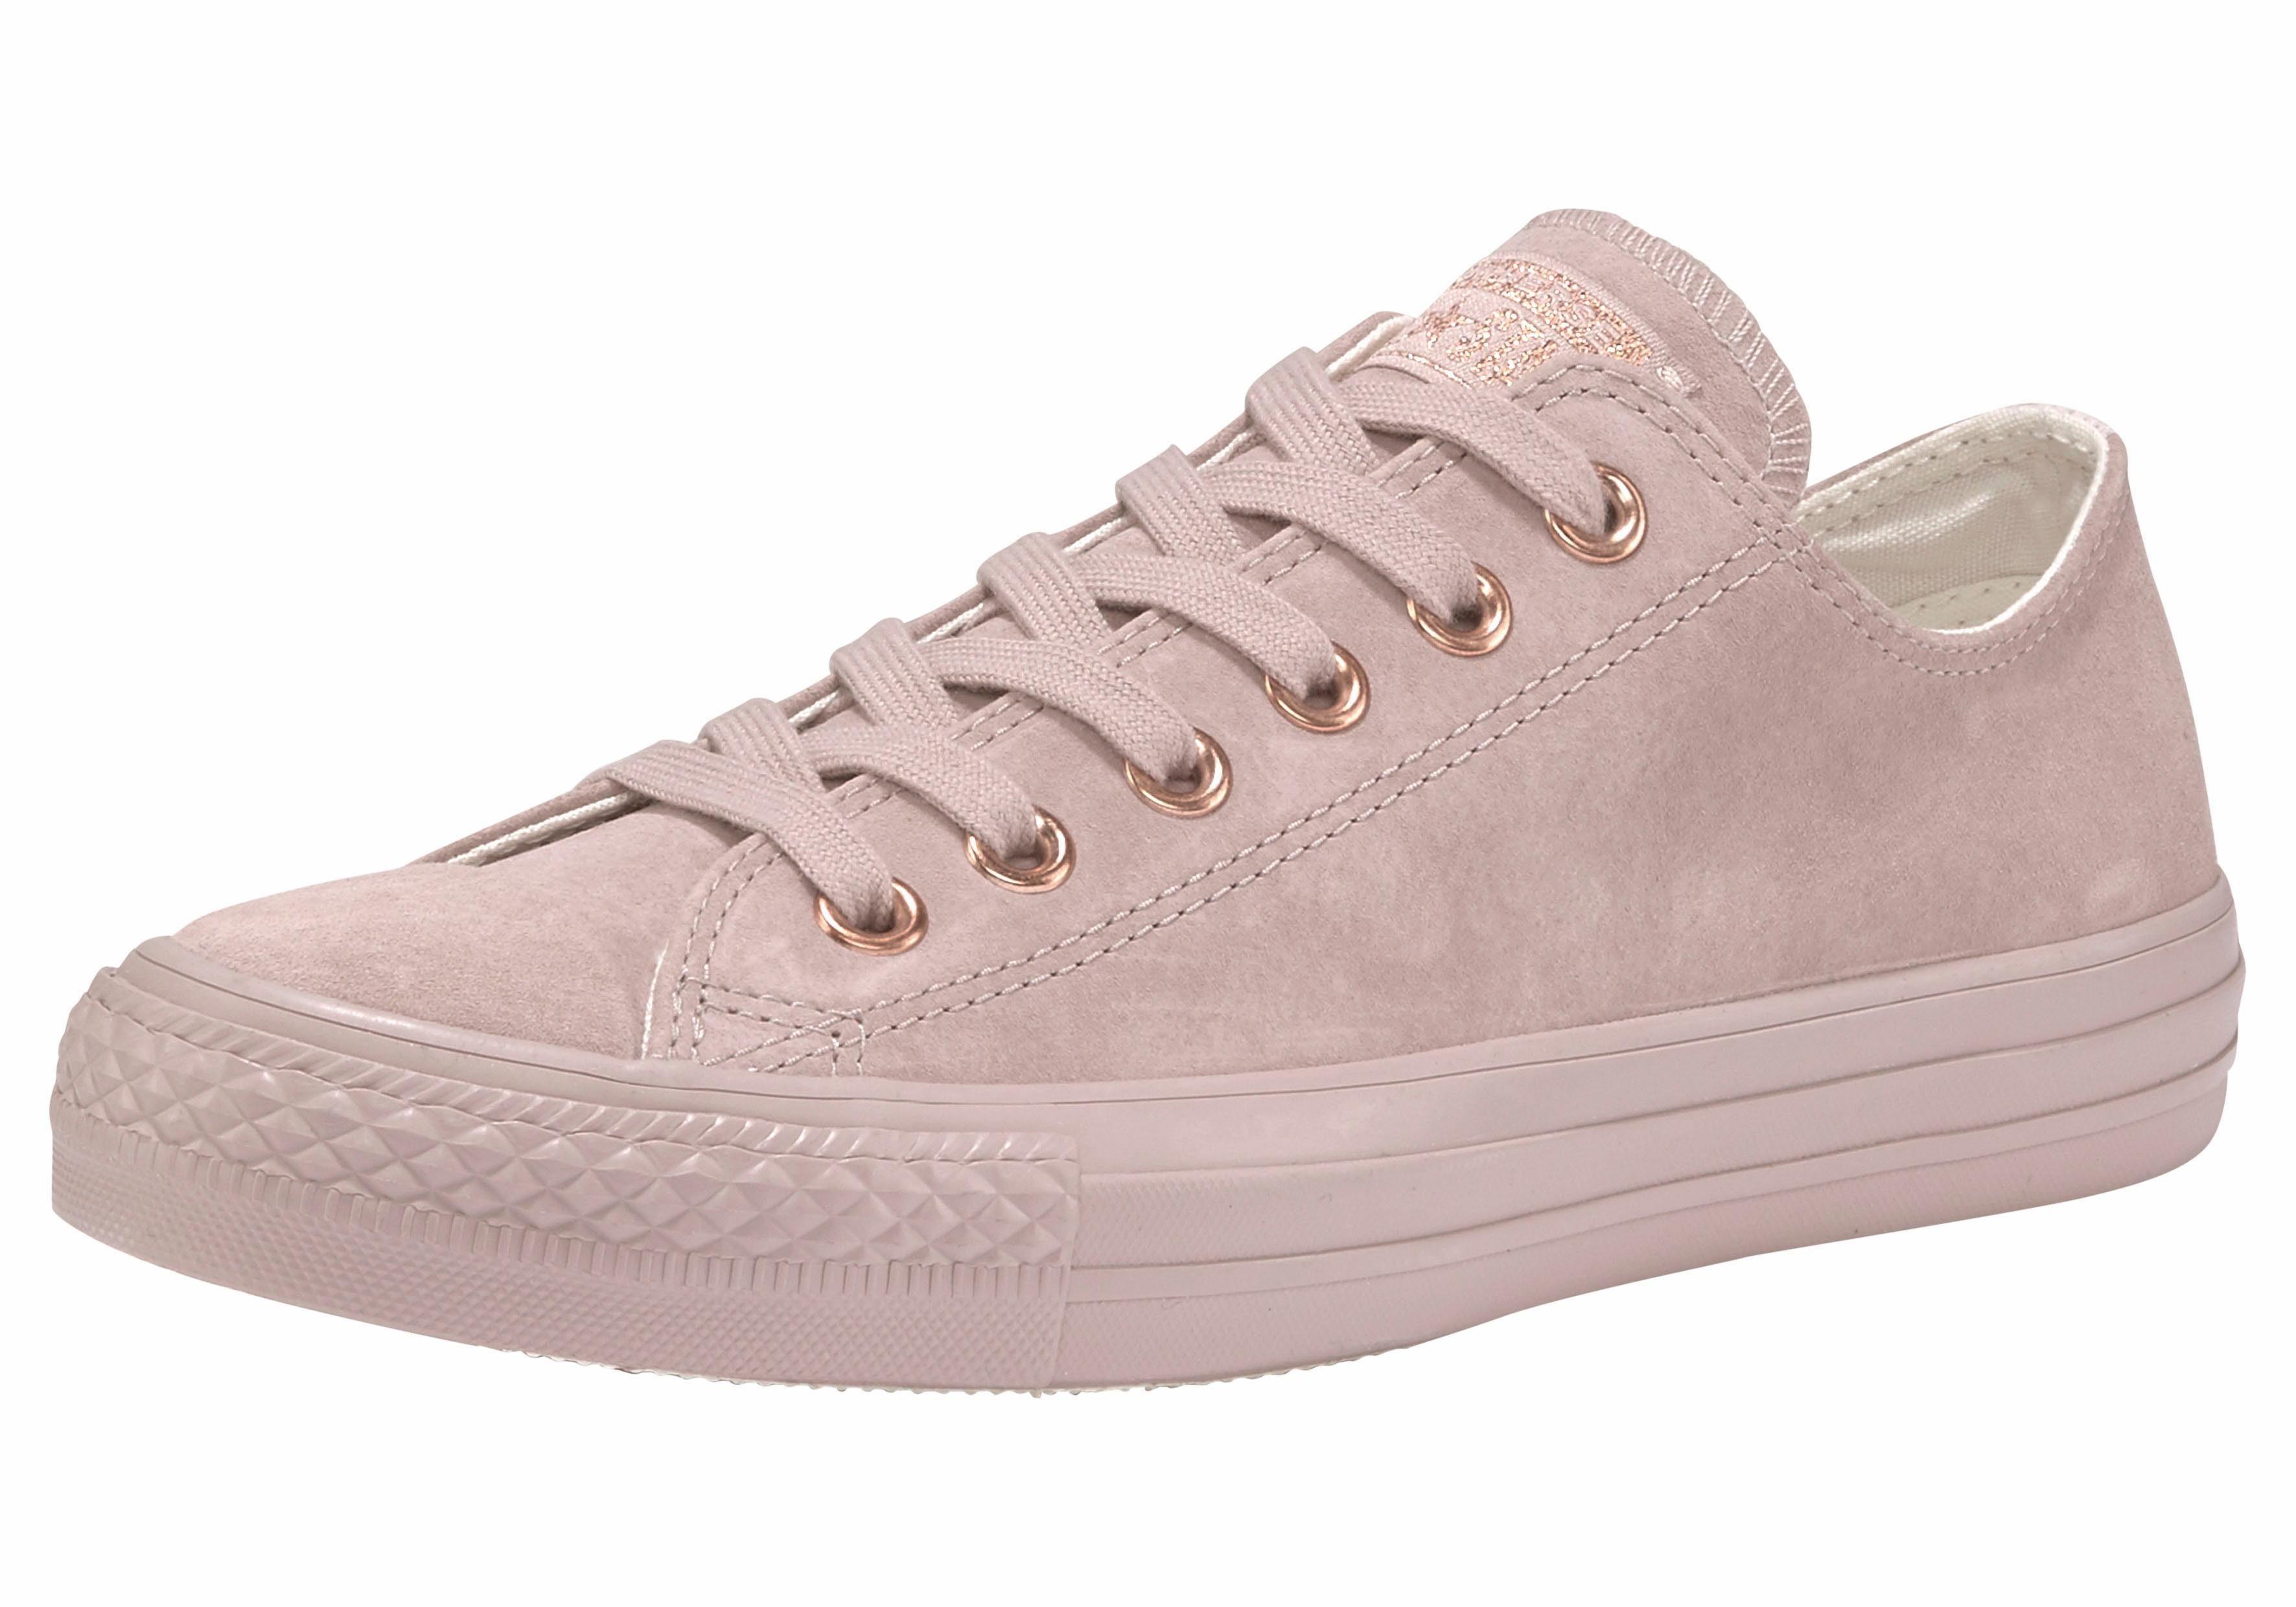 Converse Chuck Taylor All Star Ox Cherrx Blossom Sneaker online kaufen  taupe